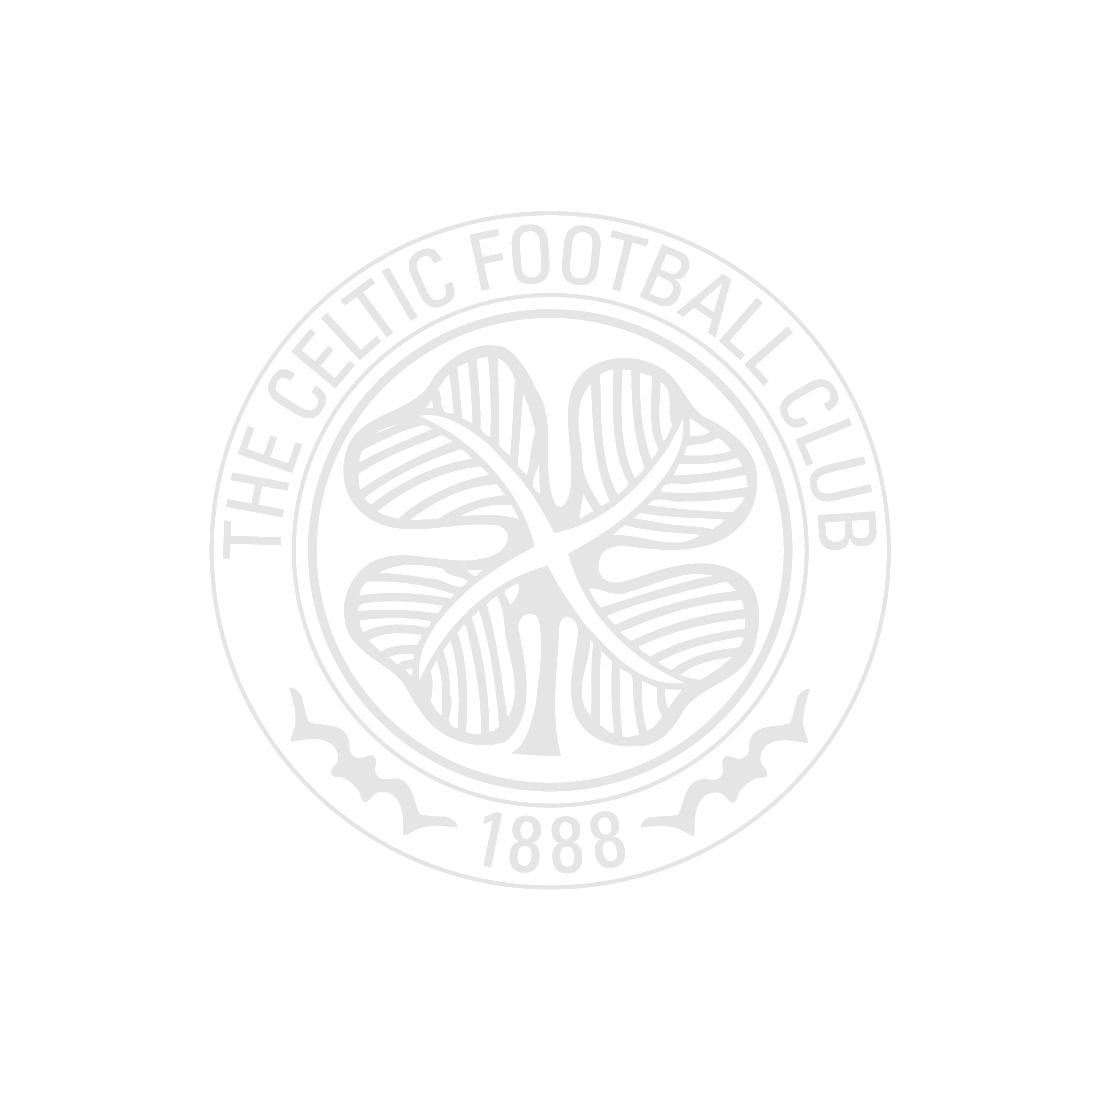 Retro Airline Ticket Celtic T-shirt